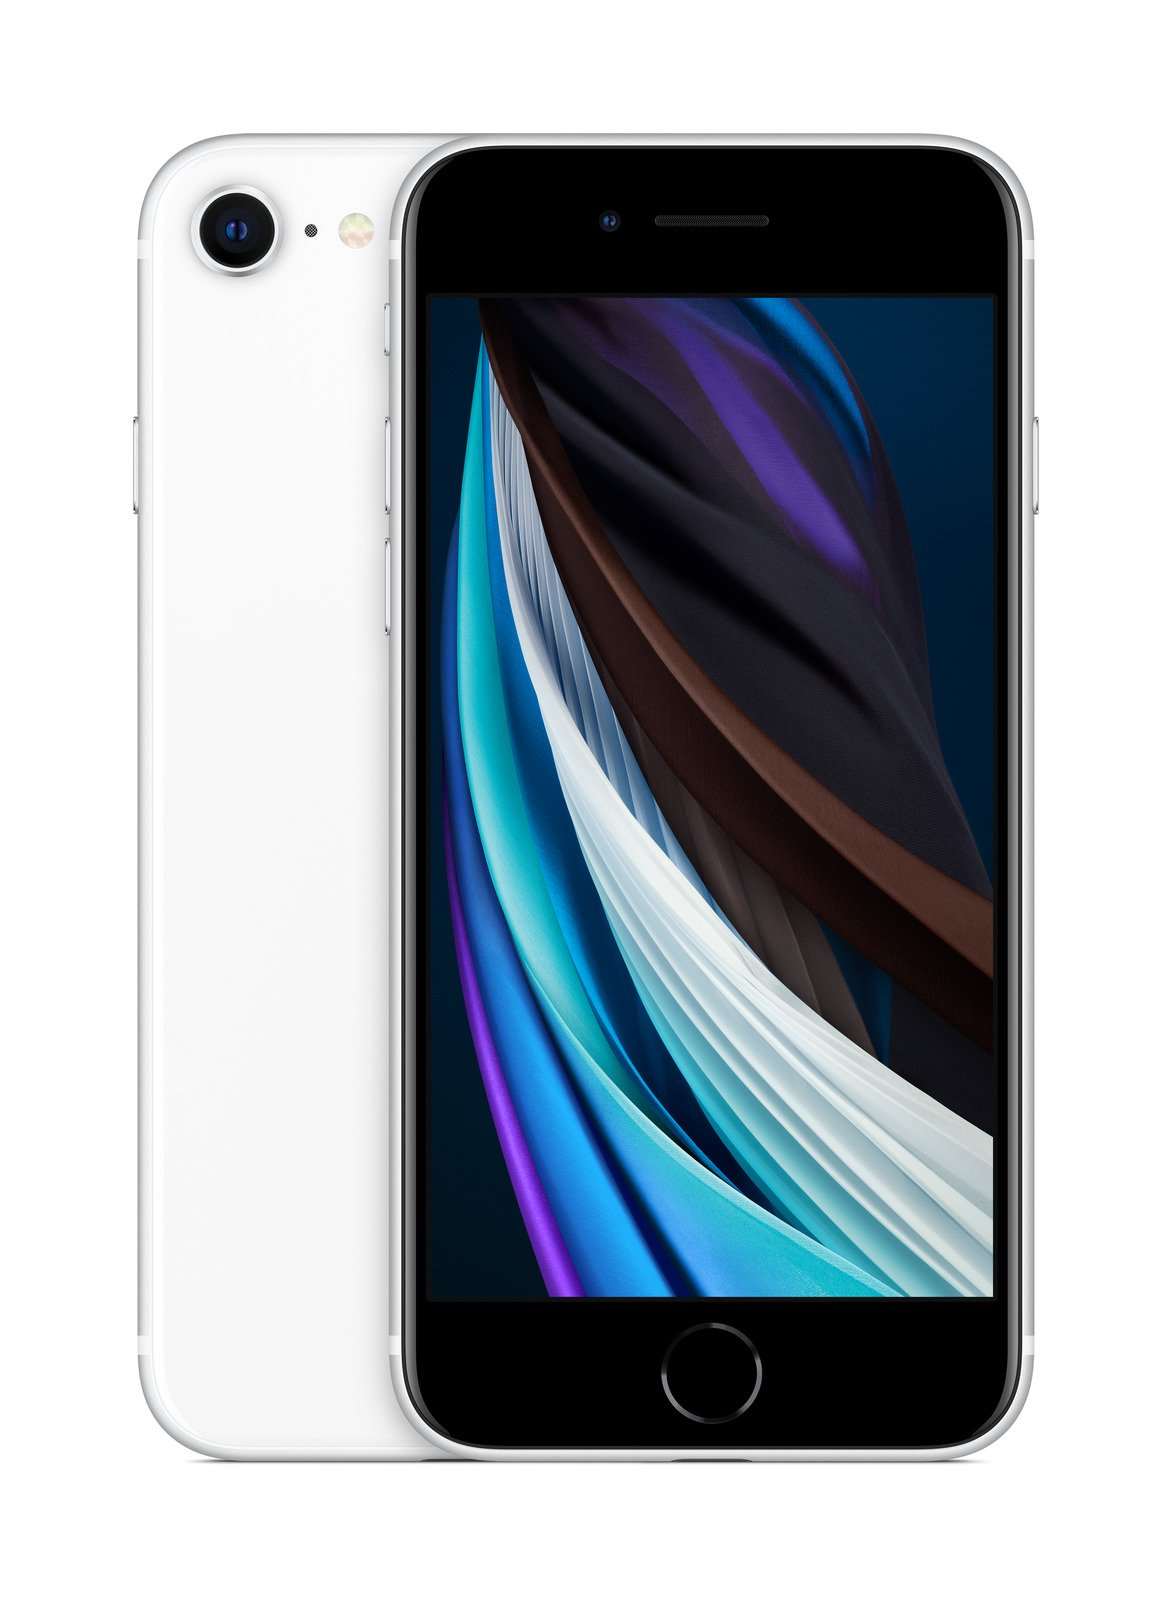 Apple iPhone SE 64GB weis (Retina HD Display, 4G LTE, FaceTime, 4K Videoaufnahme, MHGQ3ZD/A) MHGQ3ZD/A Mobilais Telefons